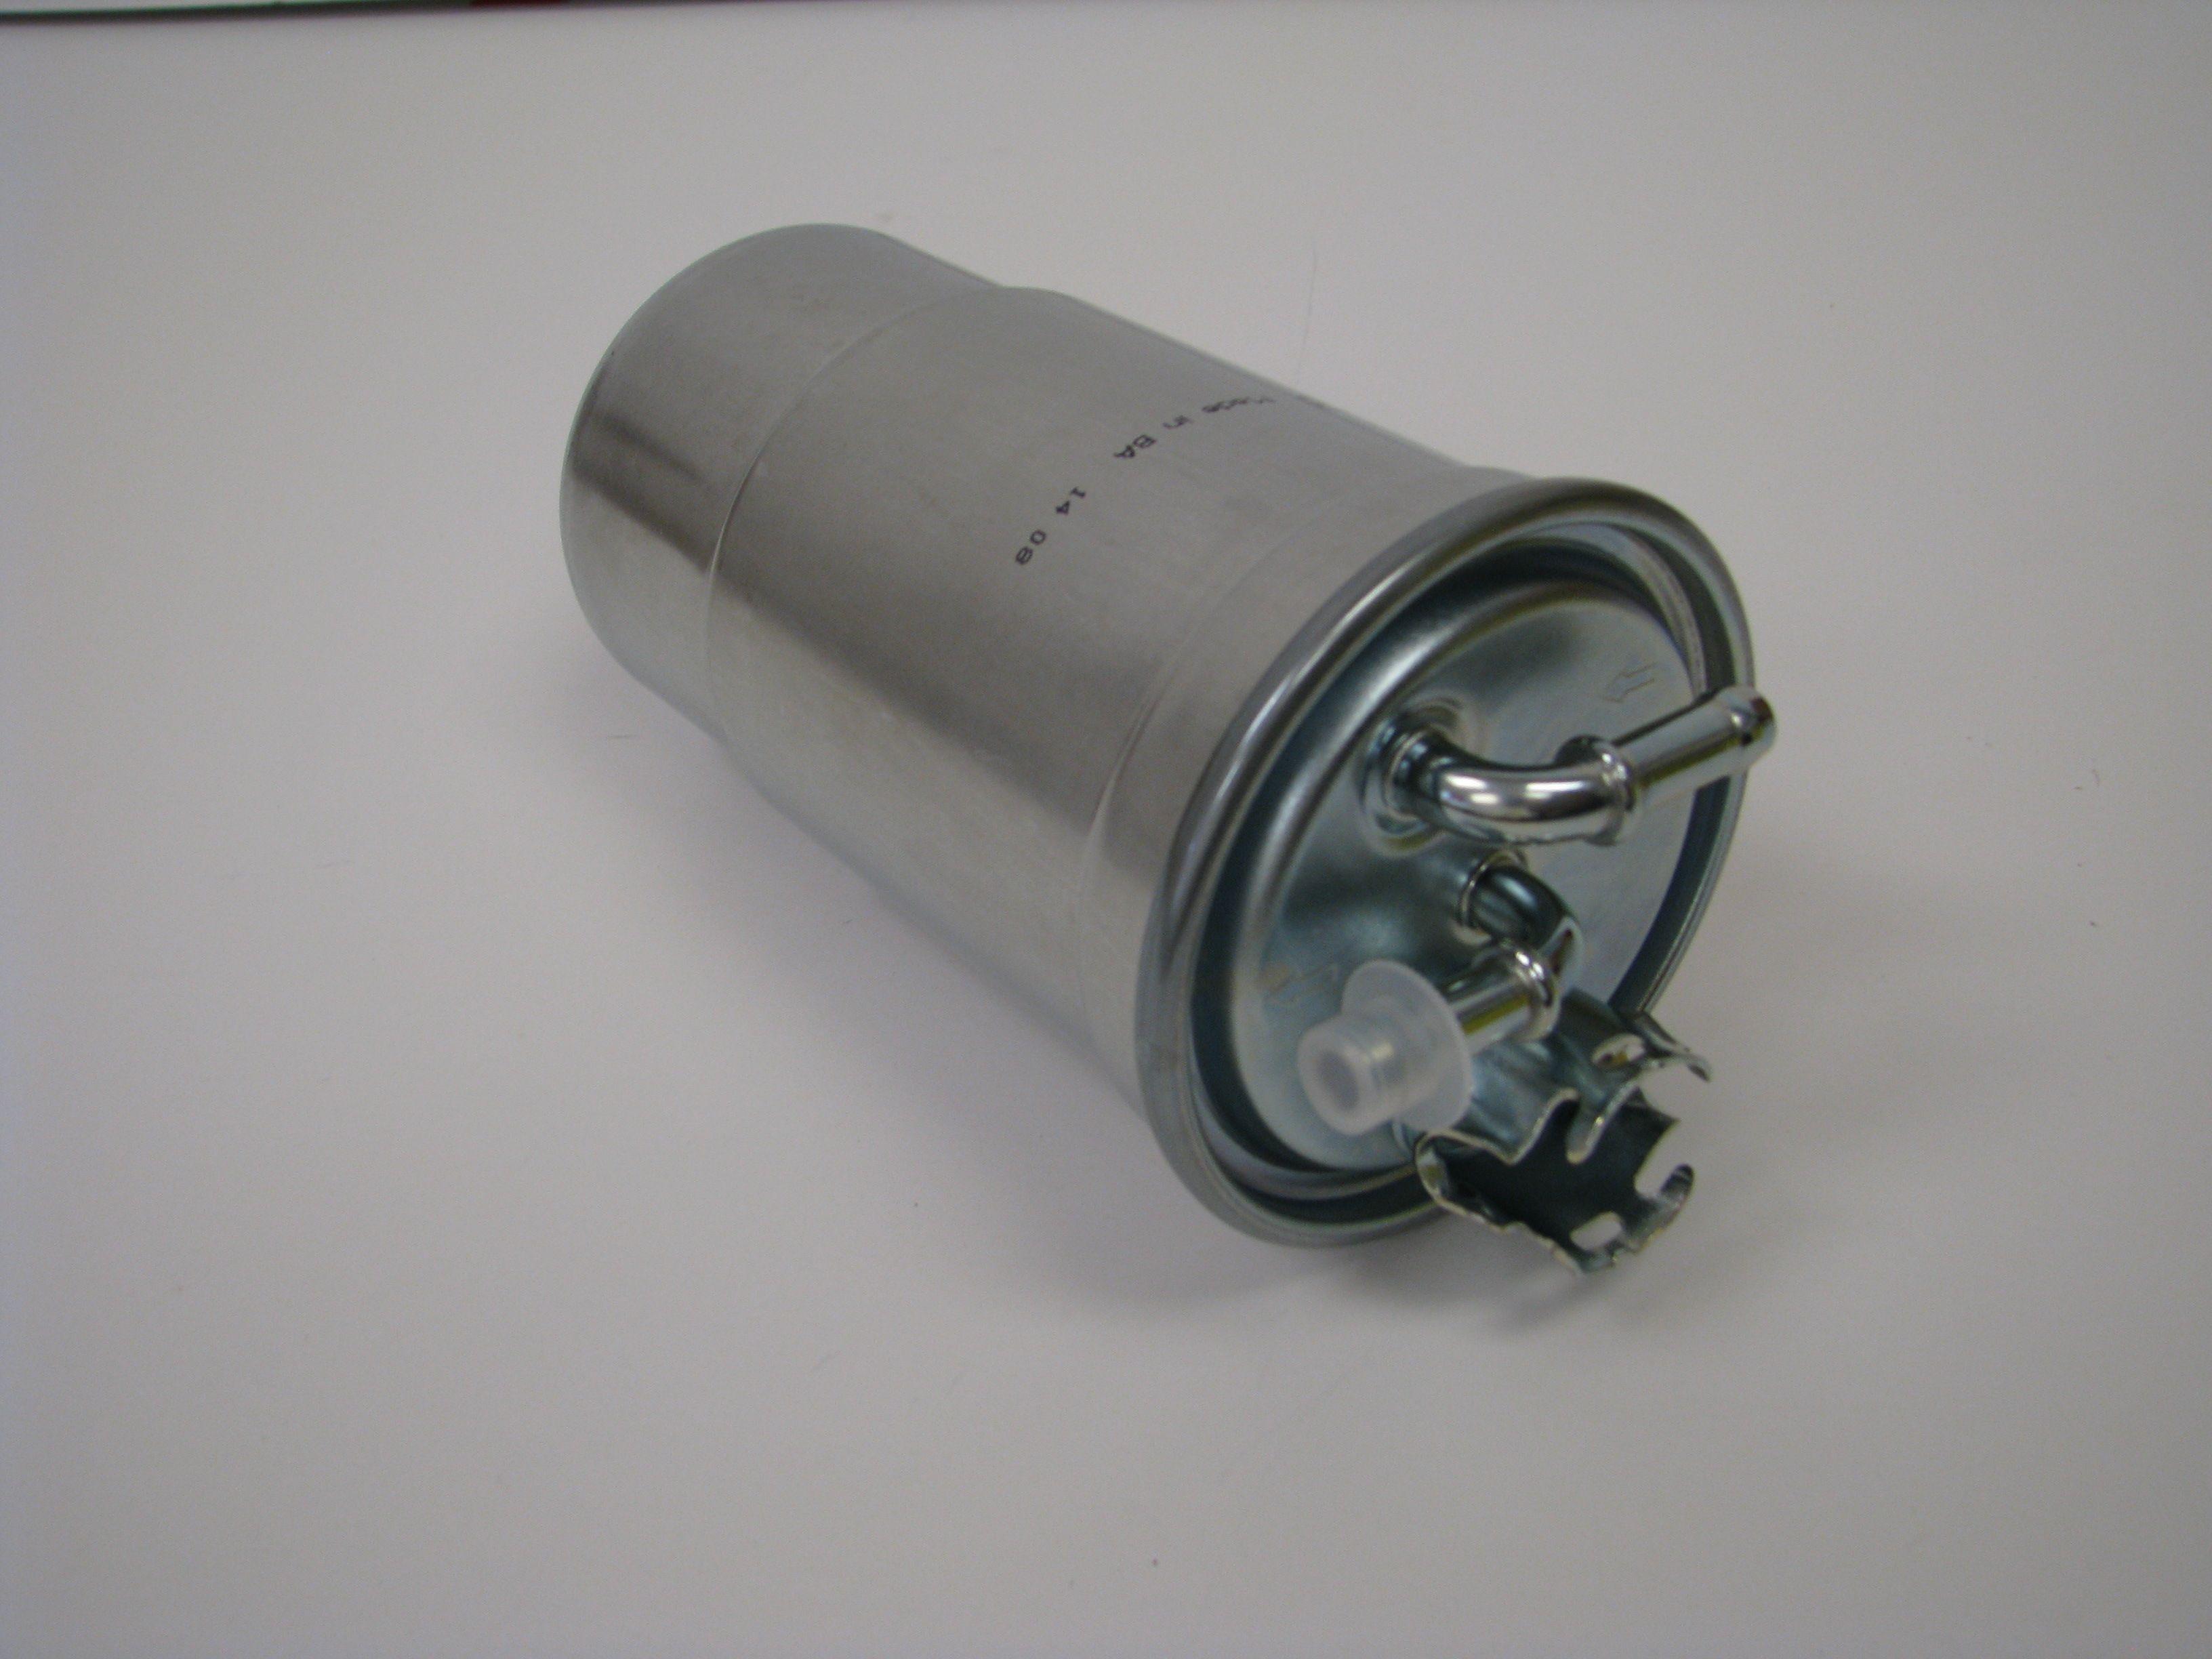 2000 tdi beetle fuel filter tdi bosch glow plugs fuel air oil filters for vw jetta ... 2000 honda prelude fuel filter